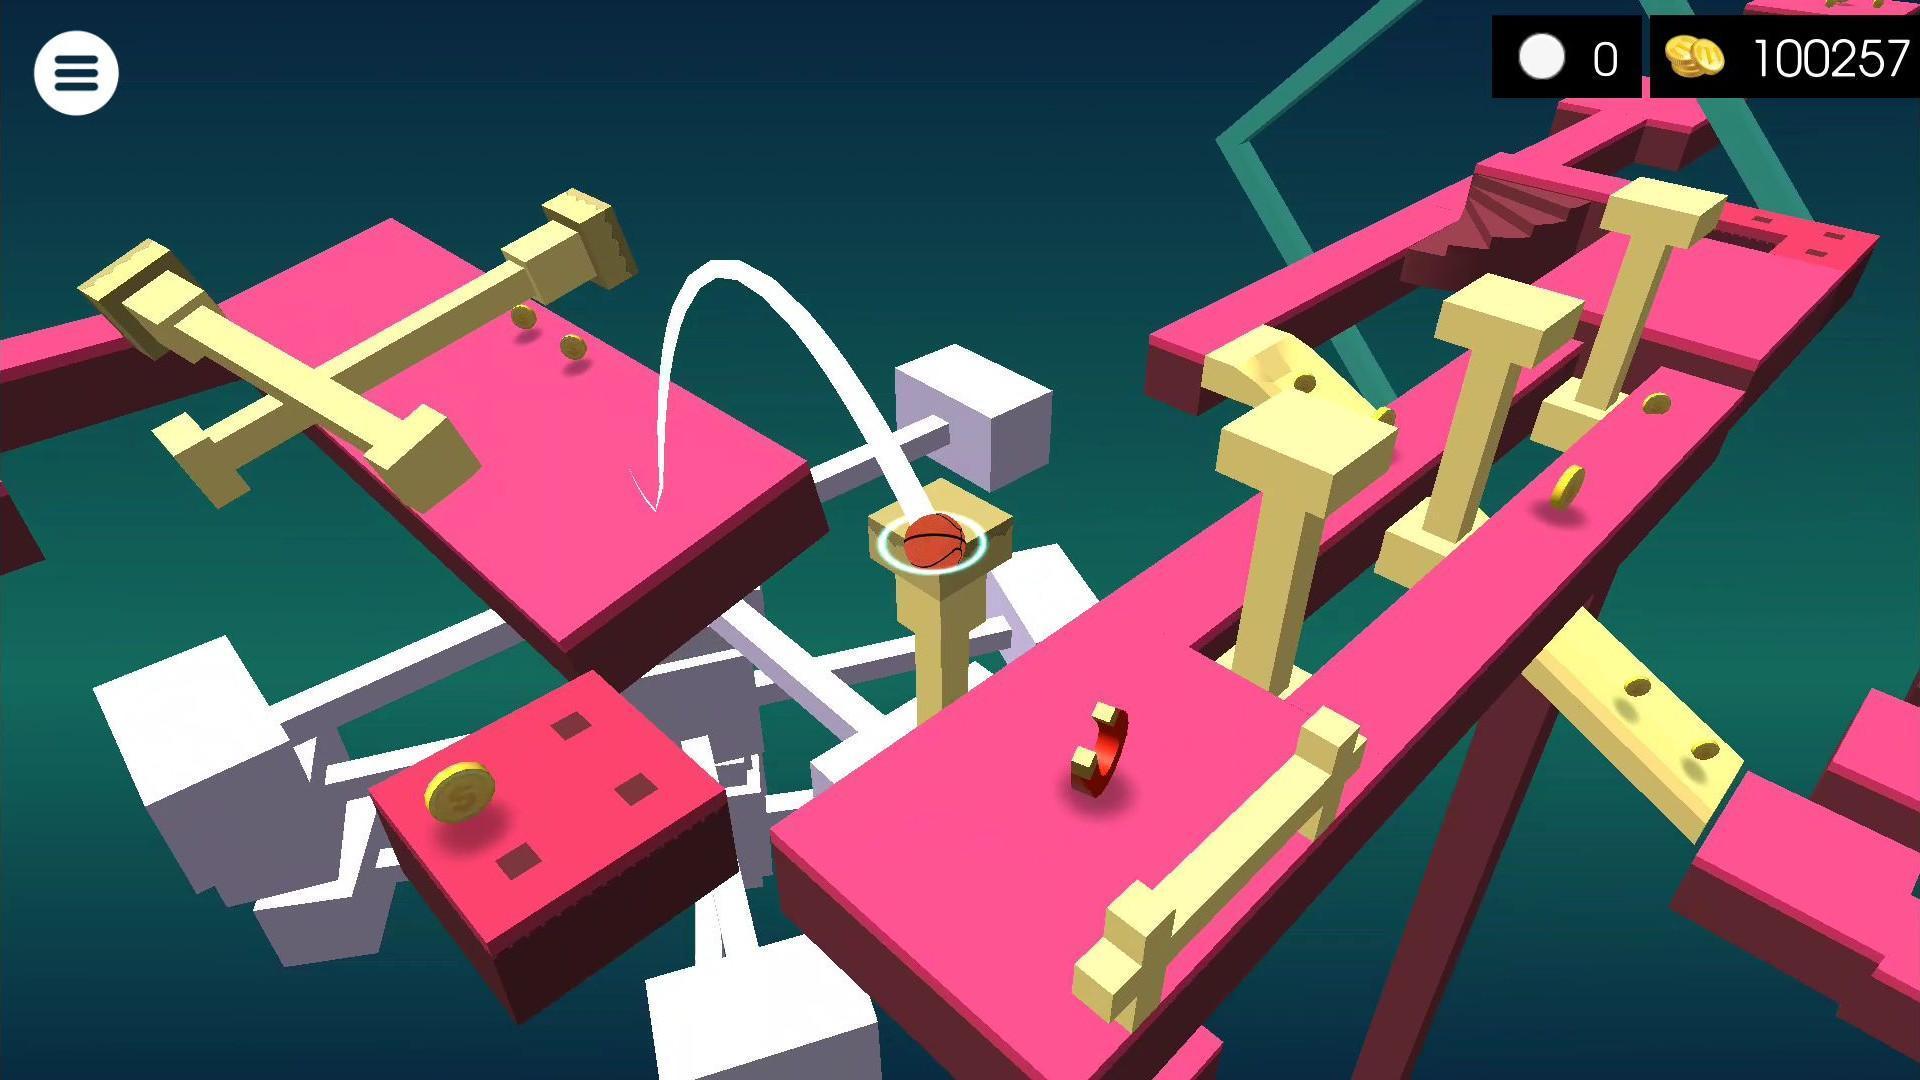 RYWO free 3D roll ball game 1.2.3 Screenshot 8